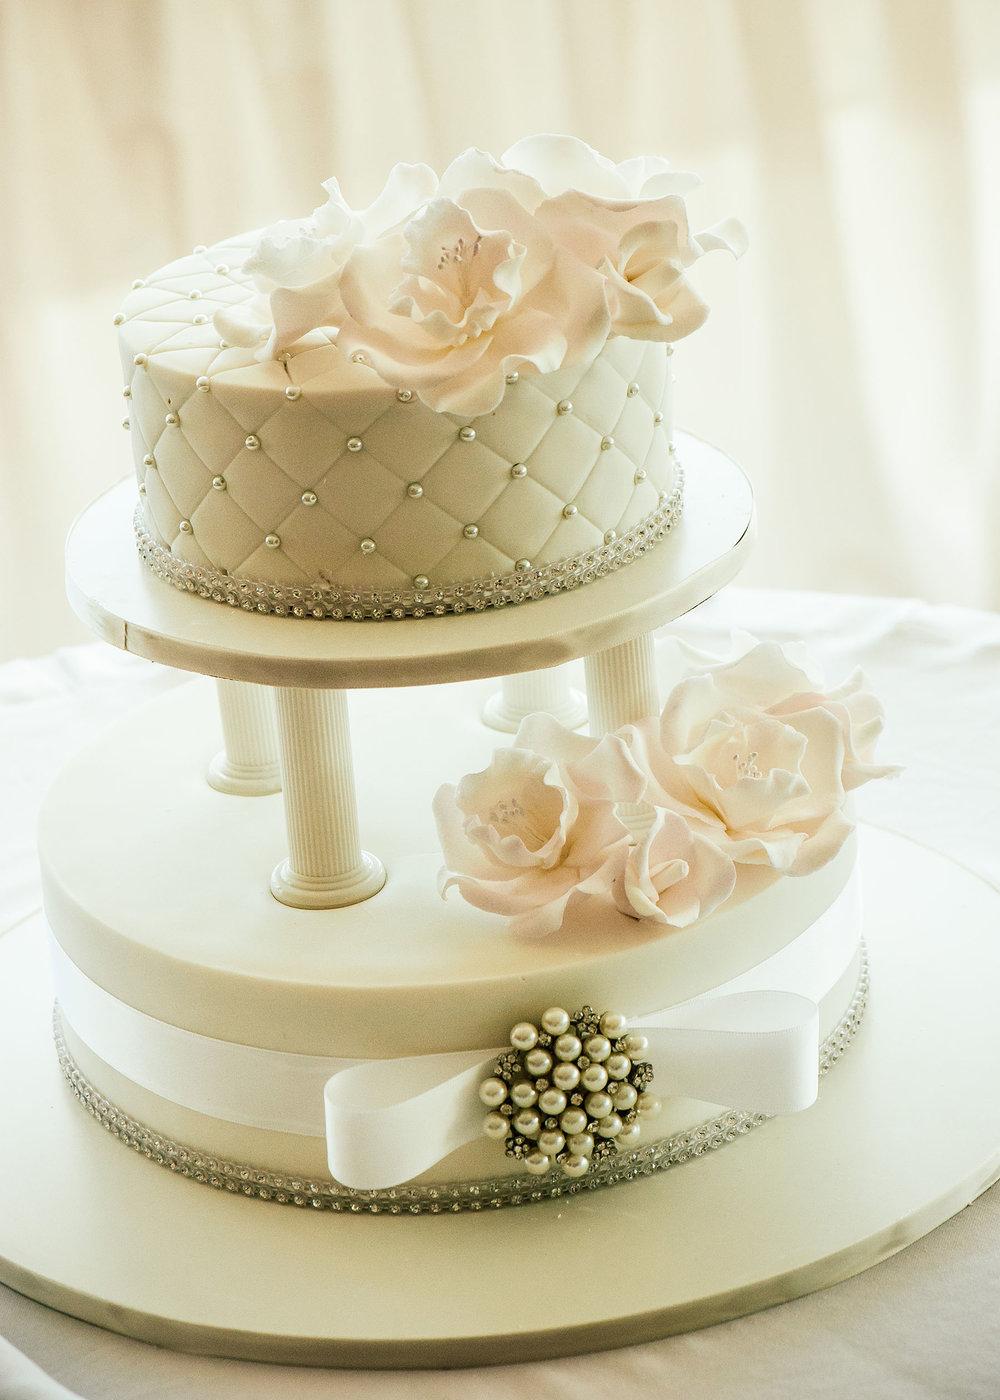 Marryme_wedding_photography_dorrigo_bellingen_photographer_22.jpg